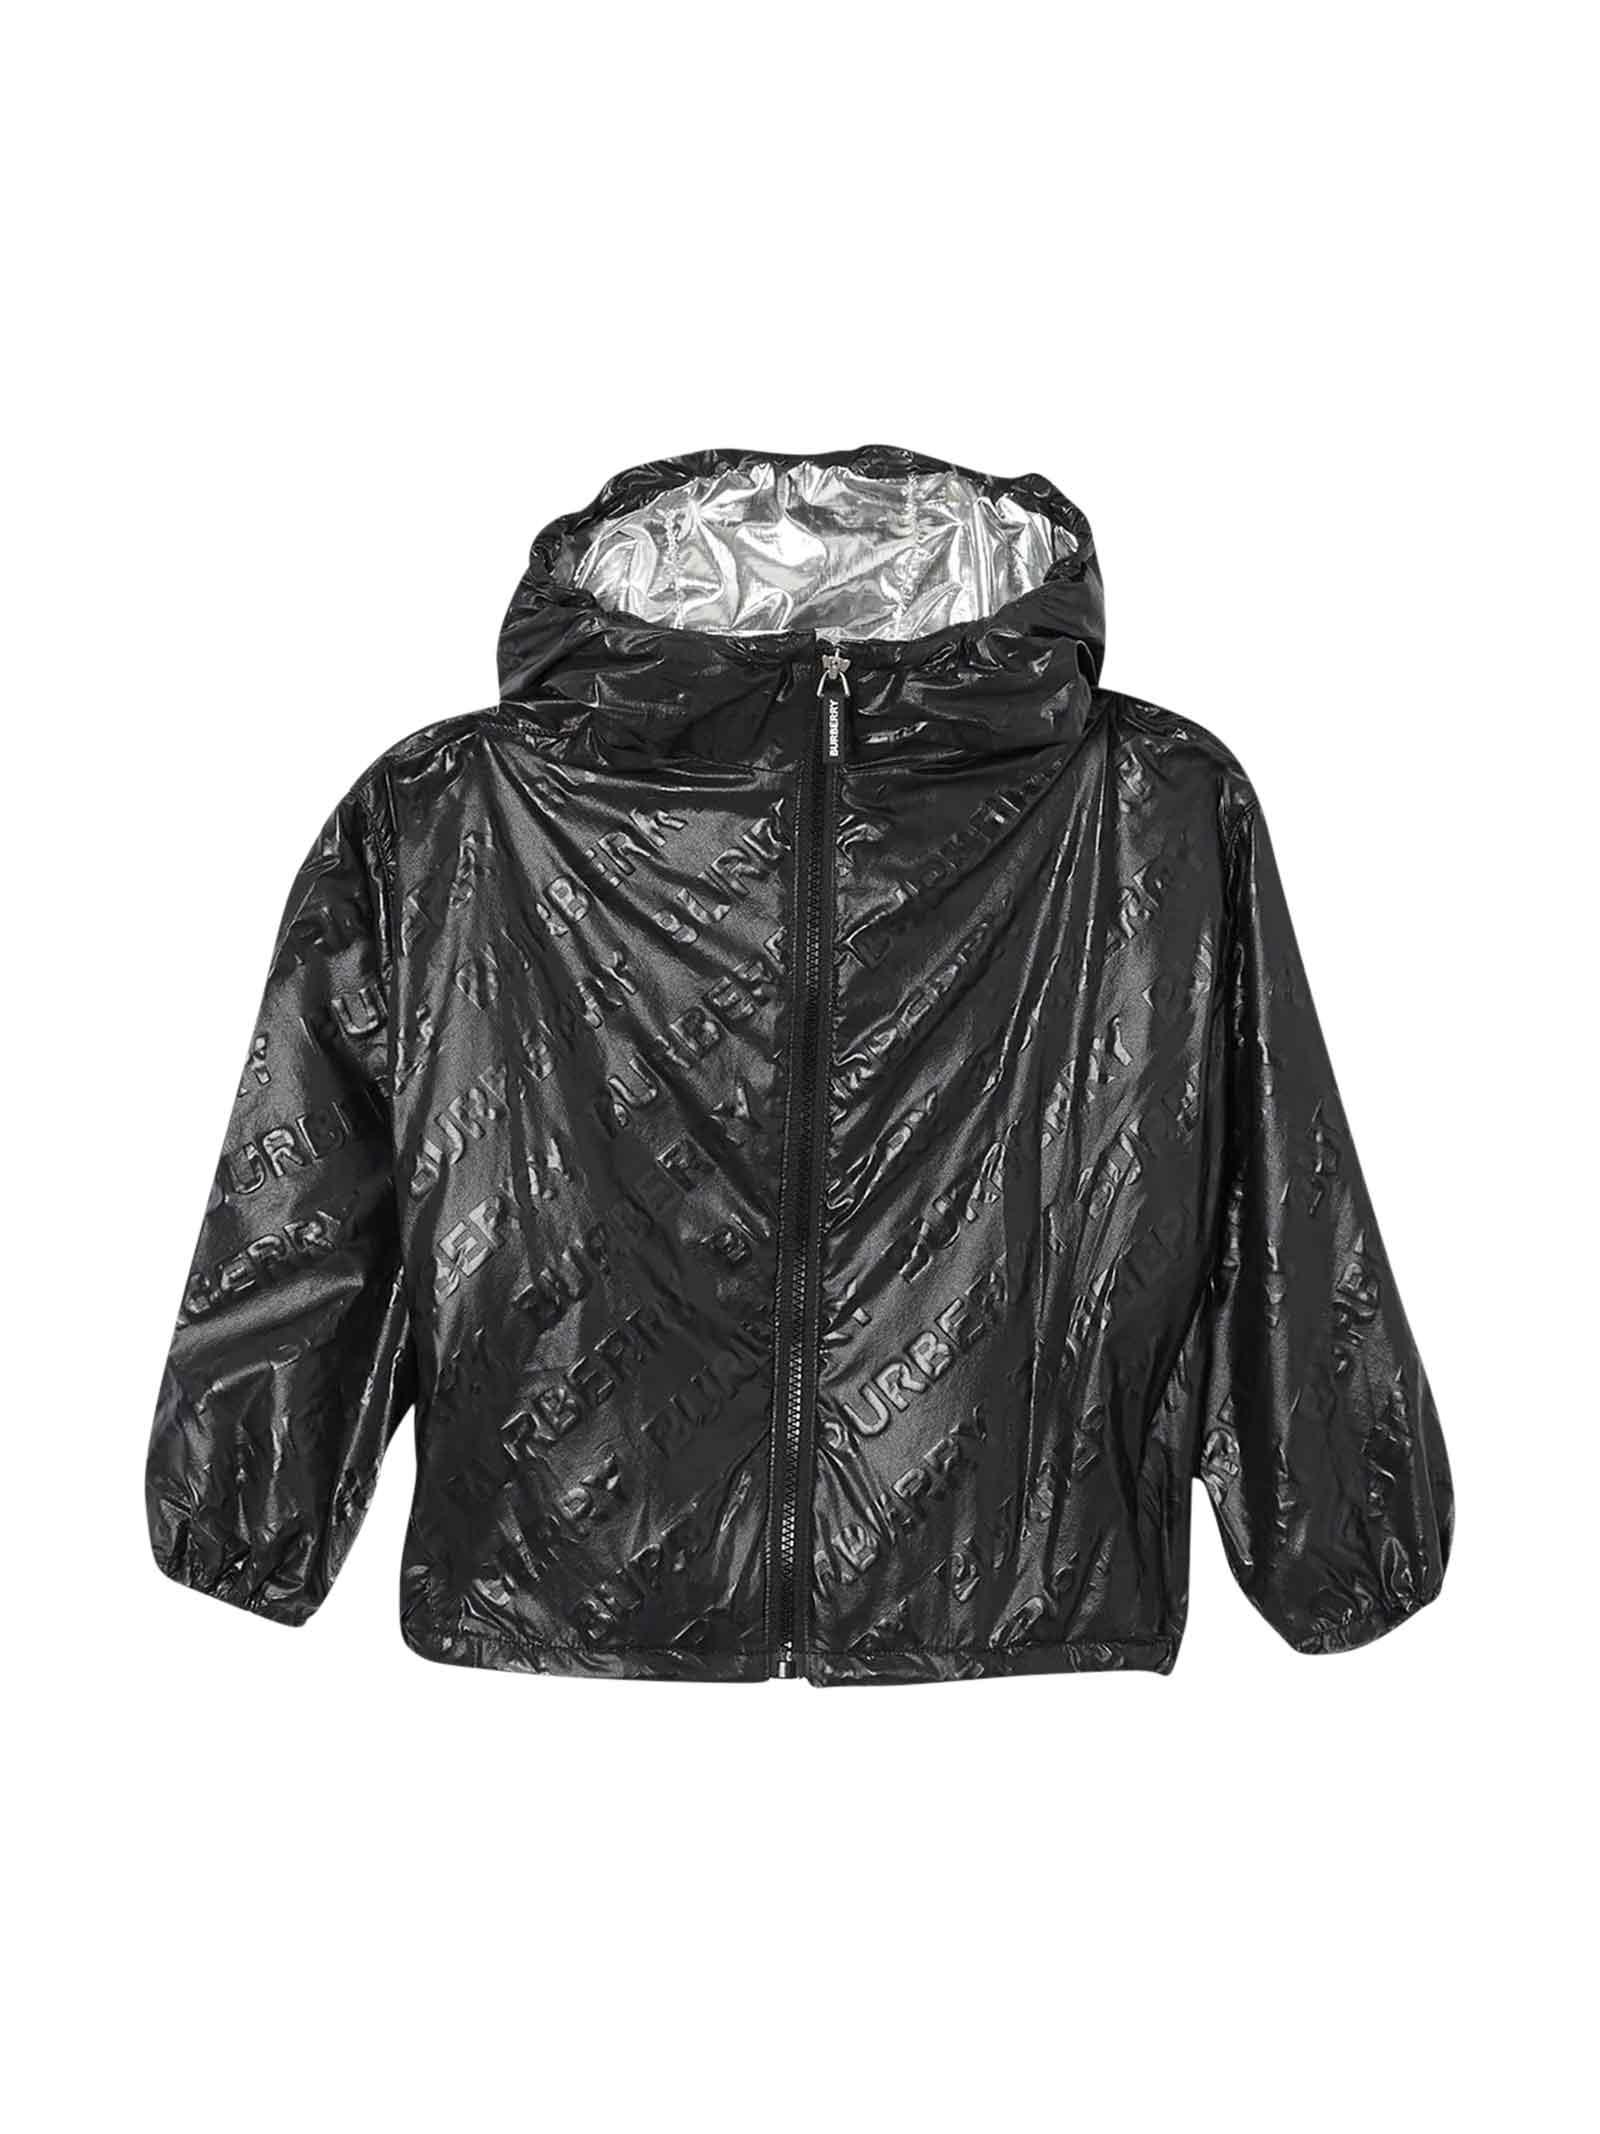 Burberry Kids' Black Jacket In Nero